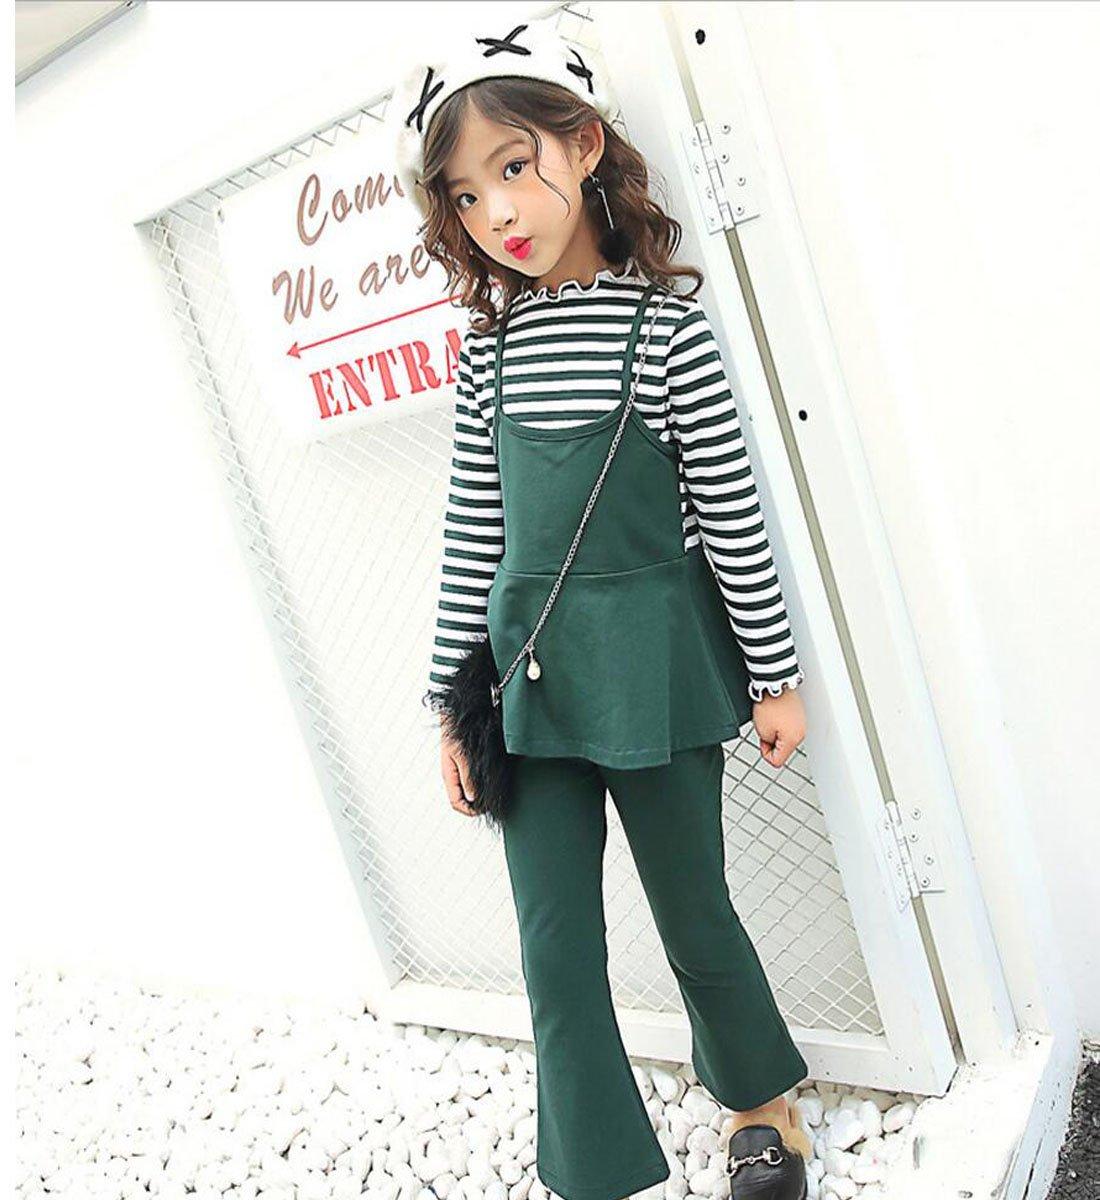 00ad524e4 nias piezas nuevo dos otoo manga larga conjunto de ropa de algodn color a  rayas trajes de dos piezas verde oscuro ef with ropa de otoo.